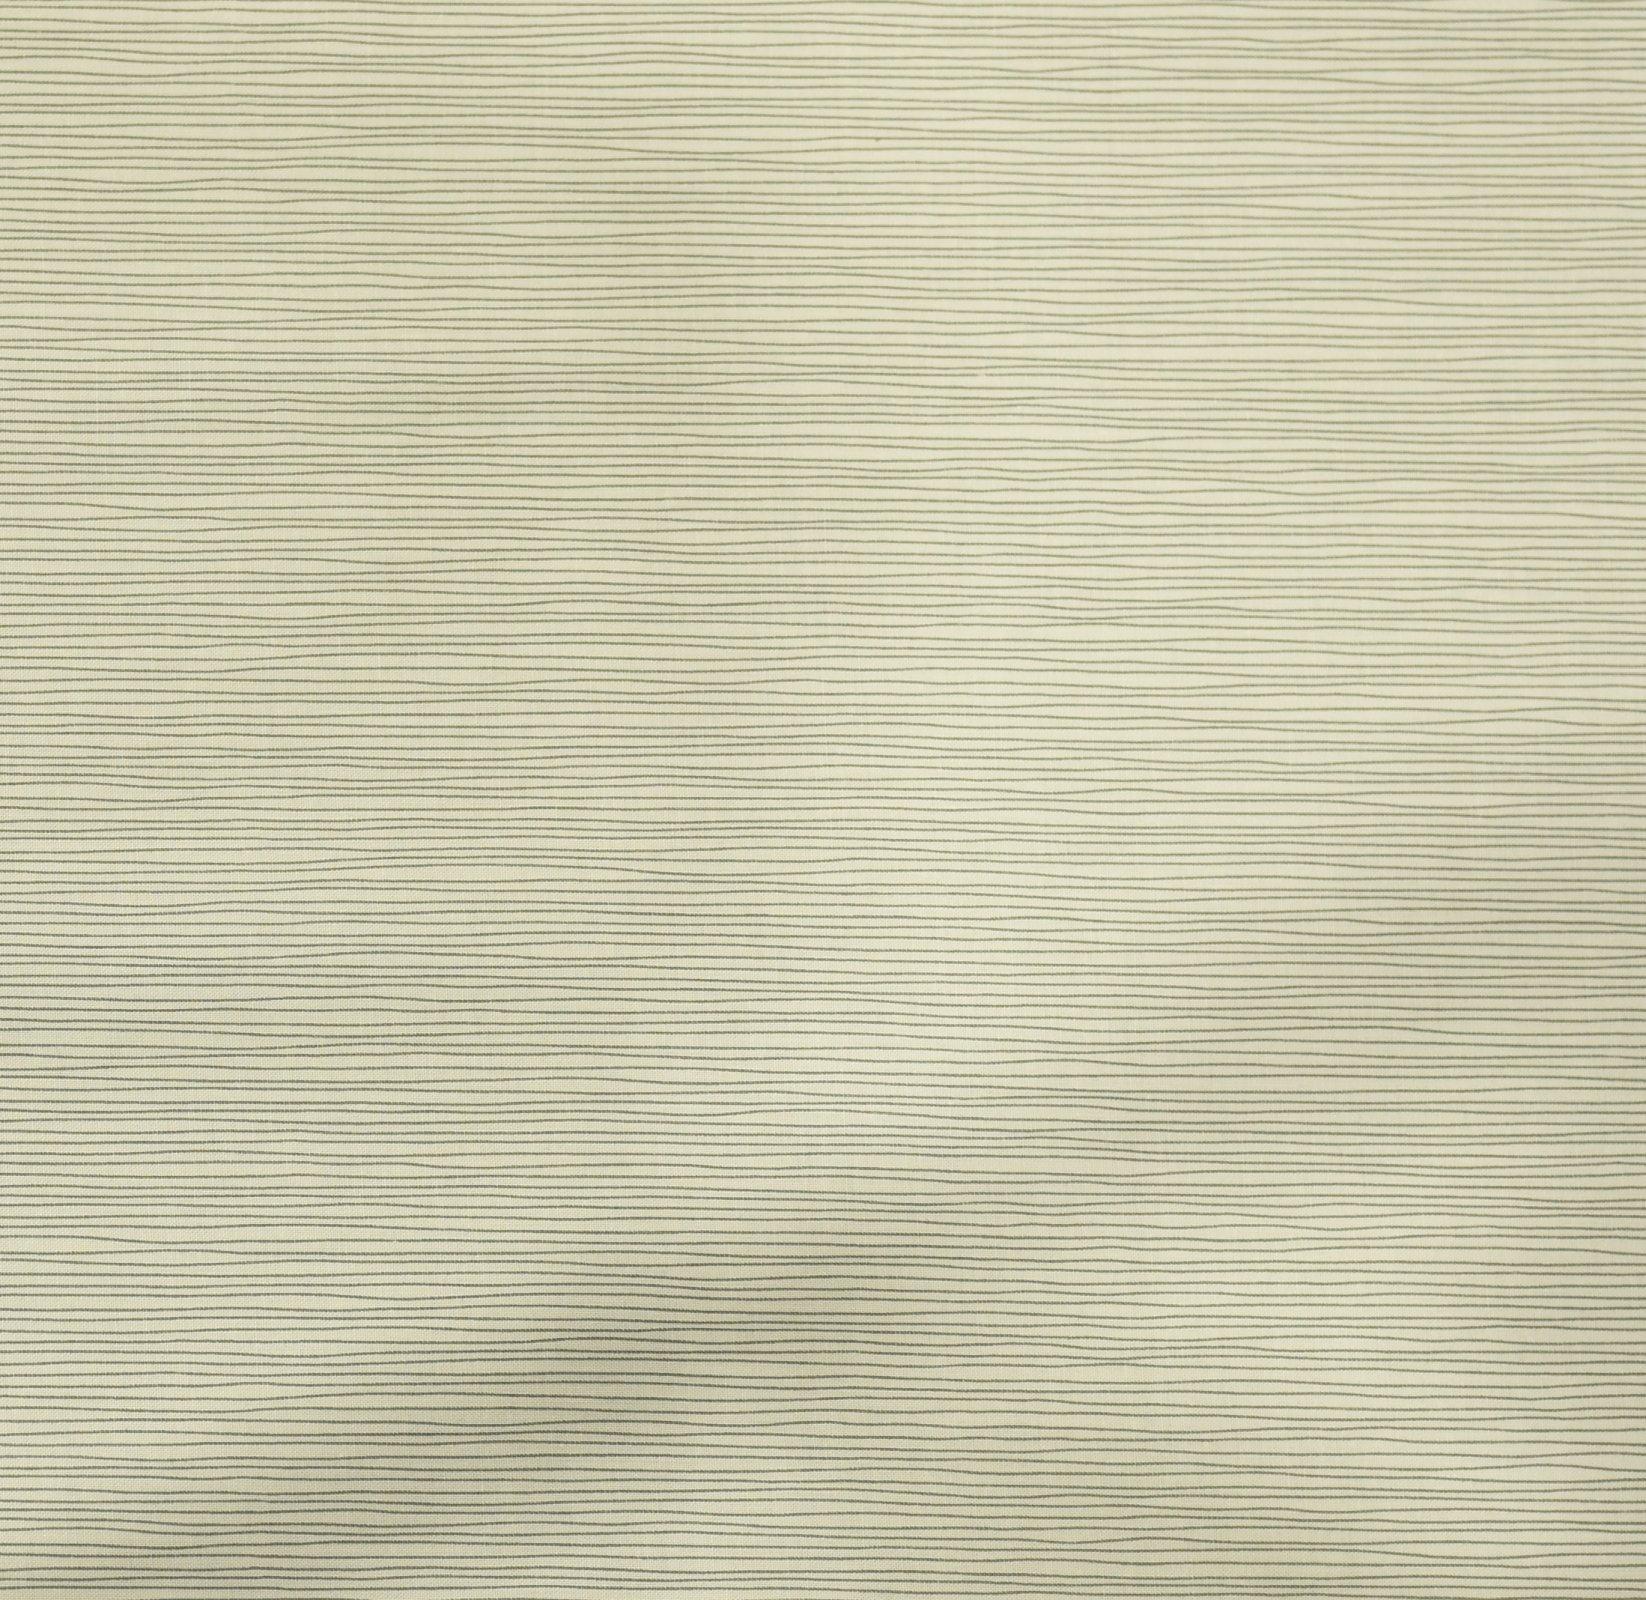 Kei Textiles - Geo Style - Linear - Cream/Beige